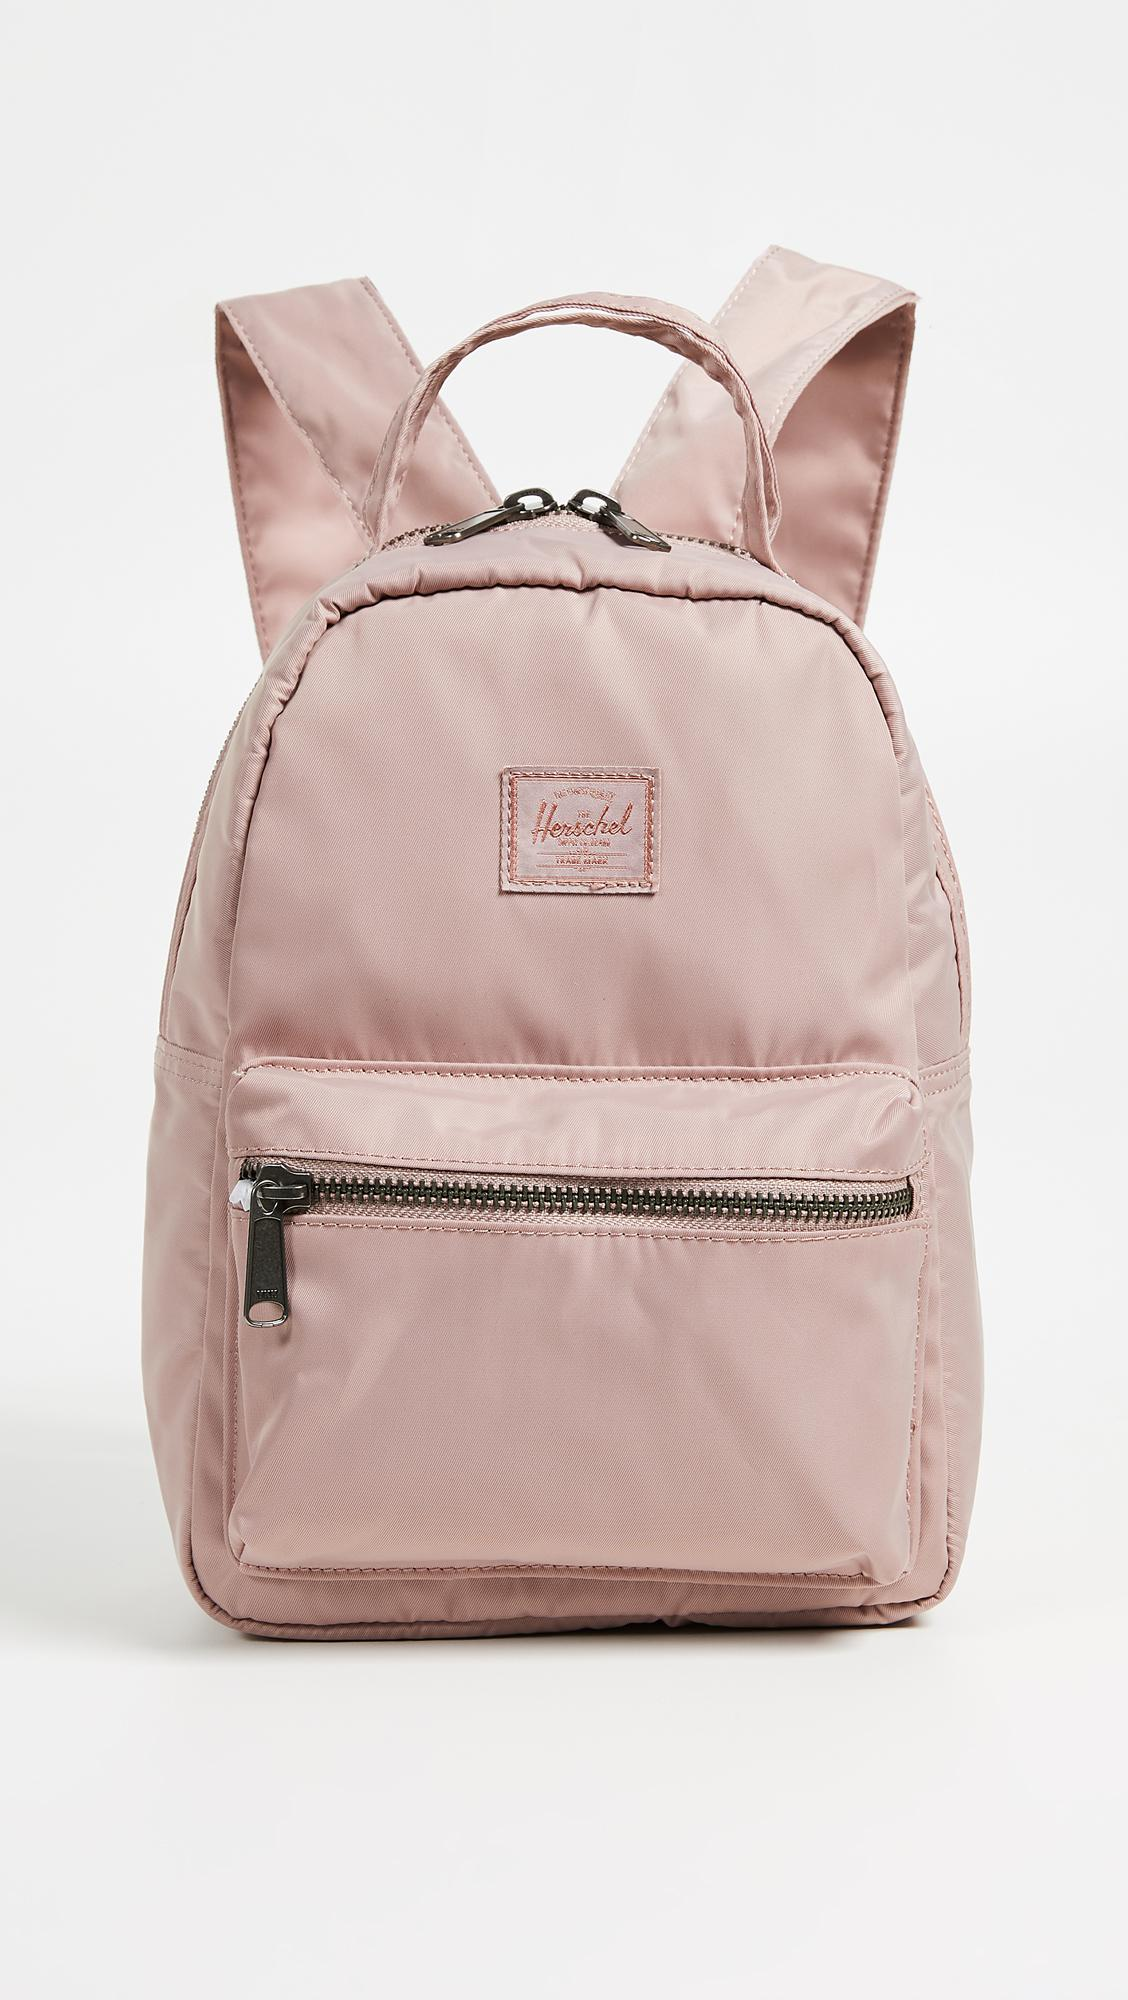 62120adacdc4 Herschel Supply Co. Flight Nova Mini Backpack - Save 29% - Lyst